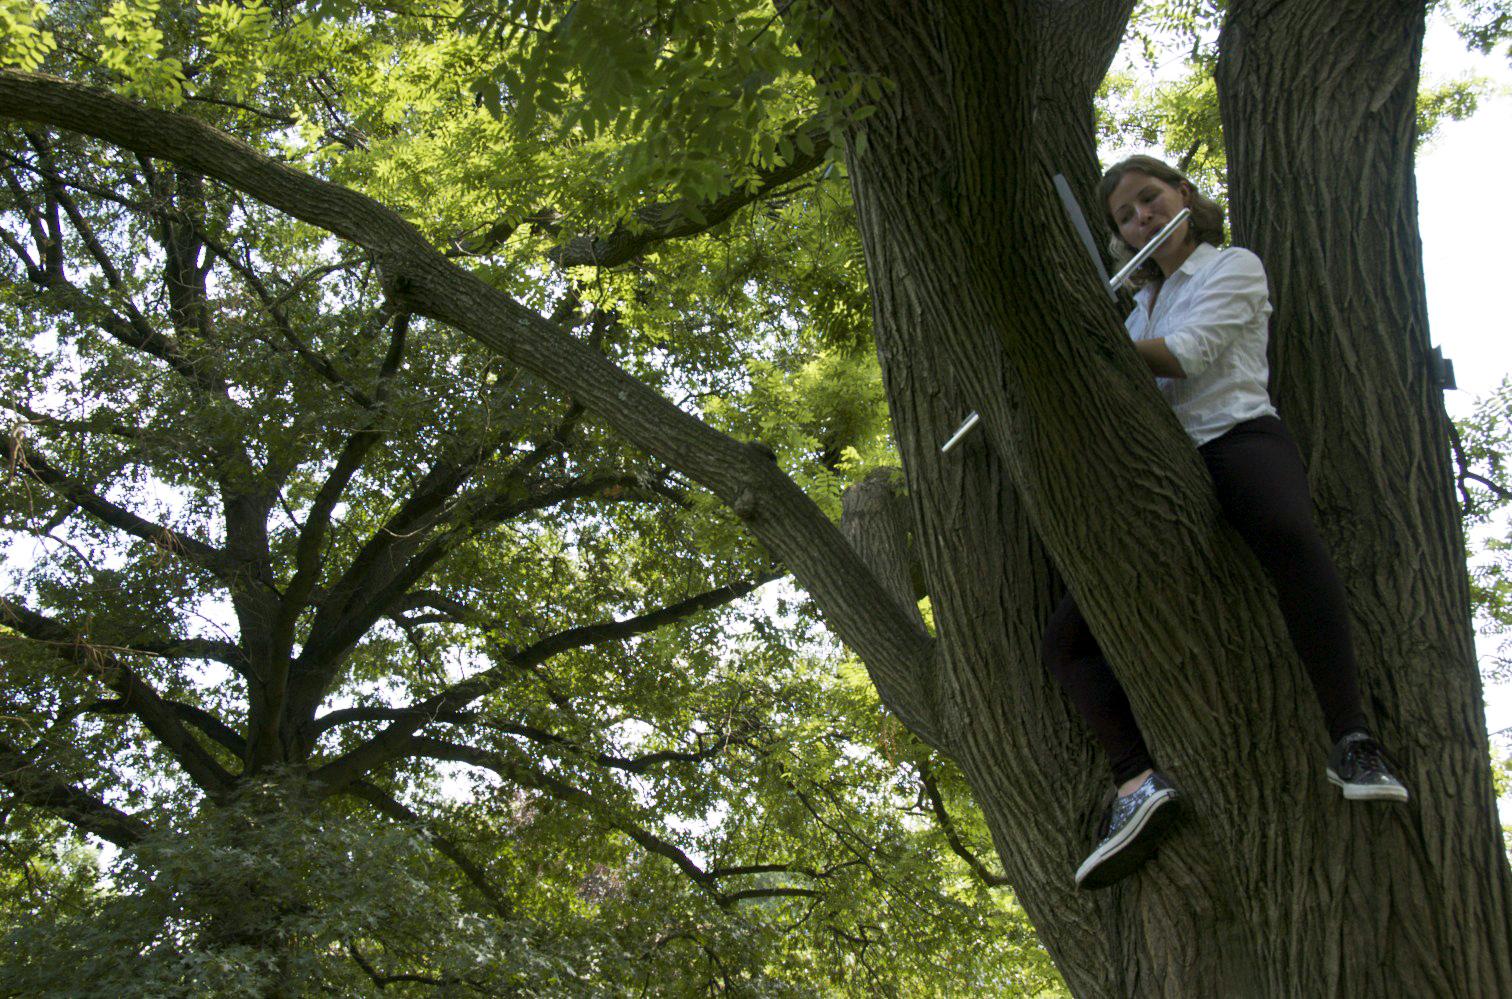 kerrith-trees.jpg